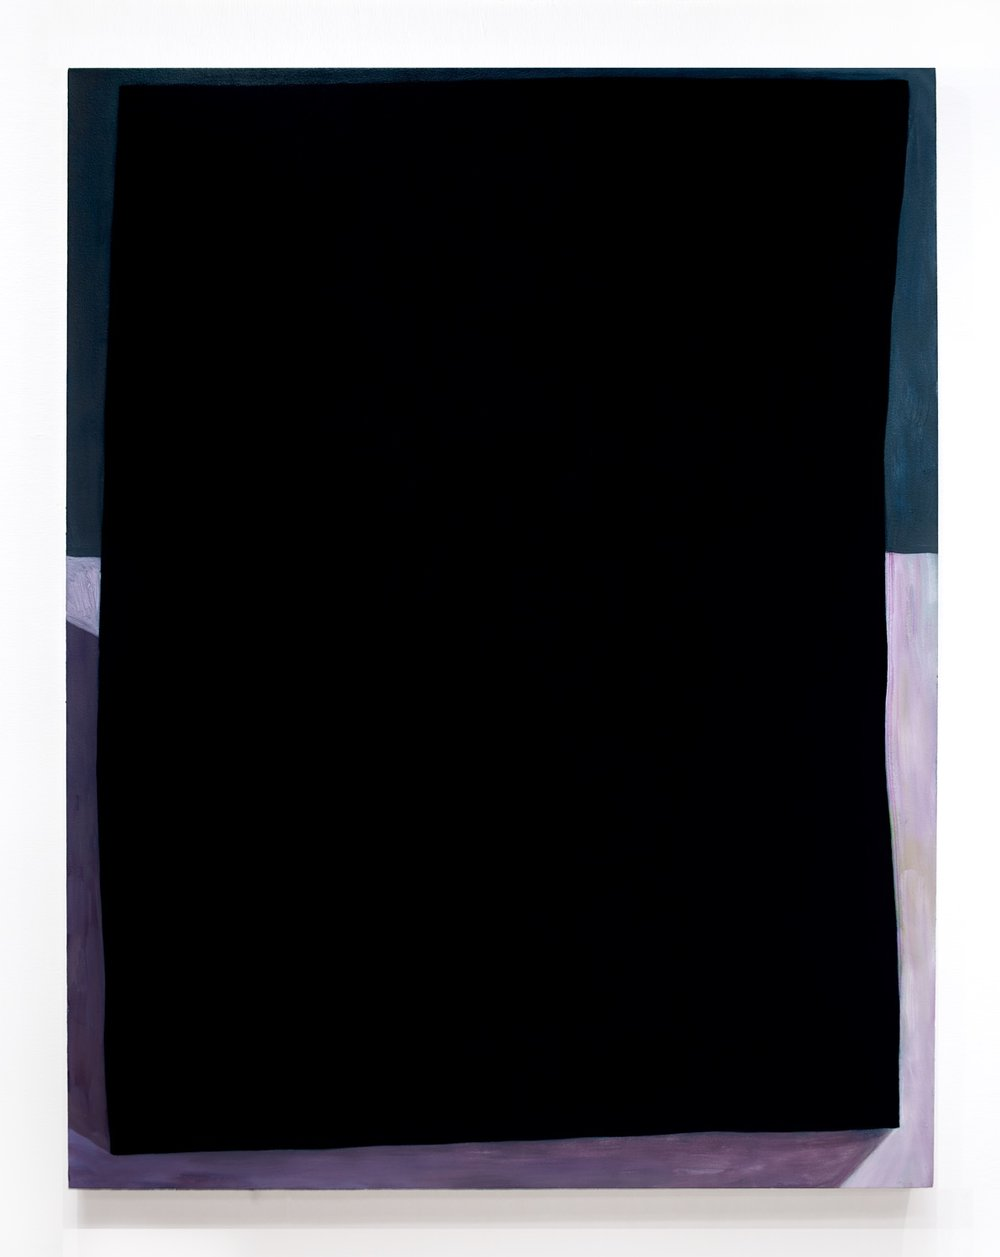 "Flat Bottomed, 2016, oil on canvas, 54""x42"" Image credit:  Kai Mushens"